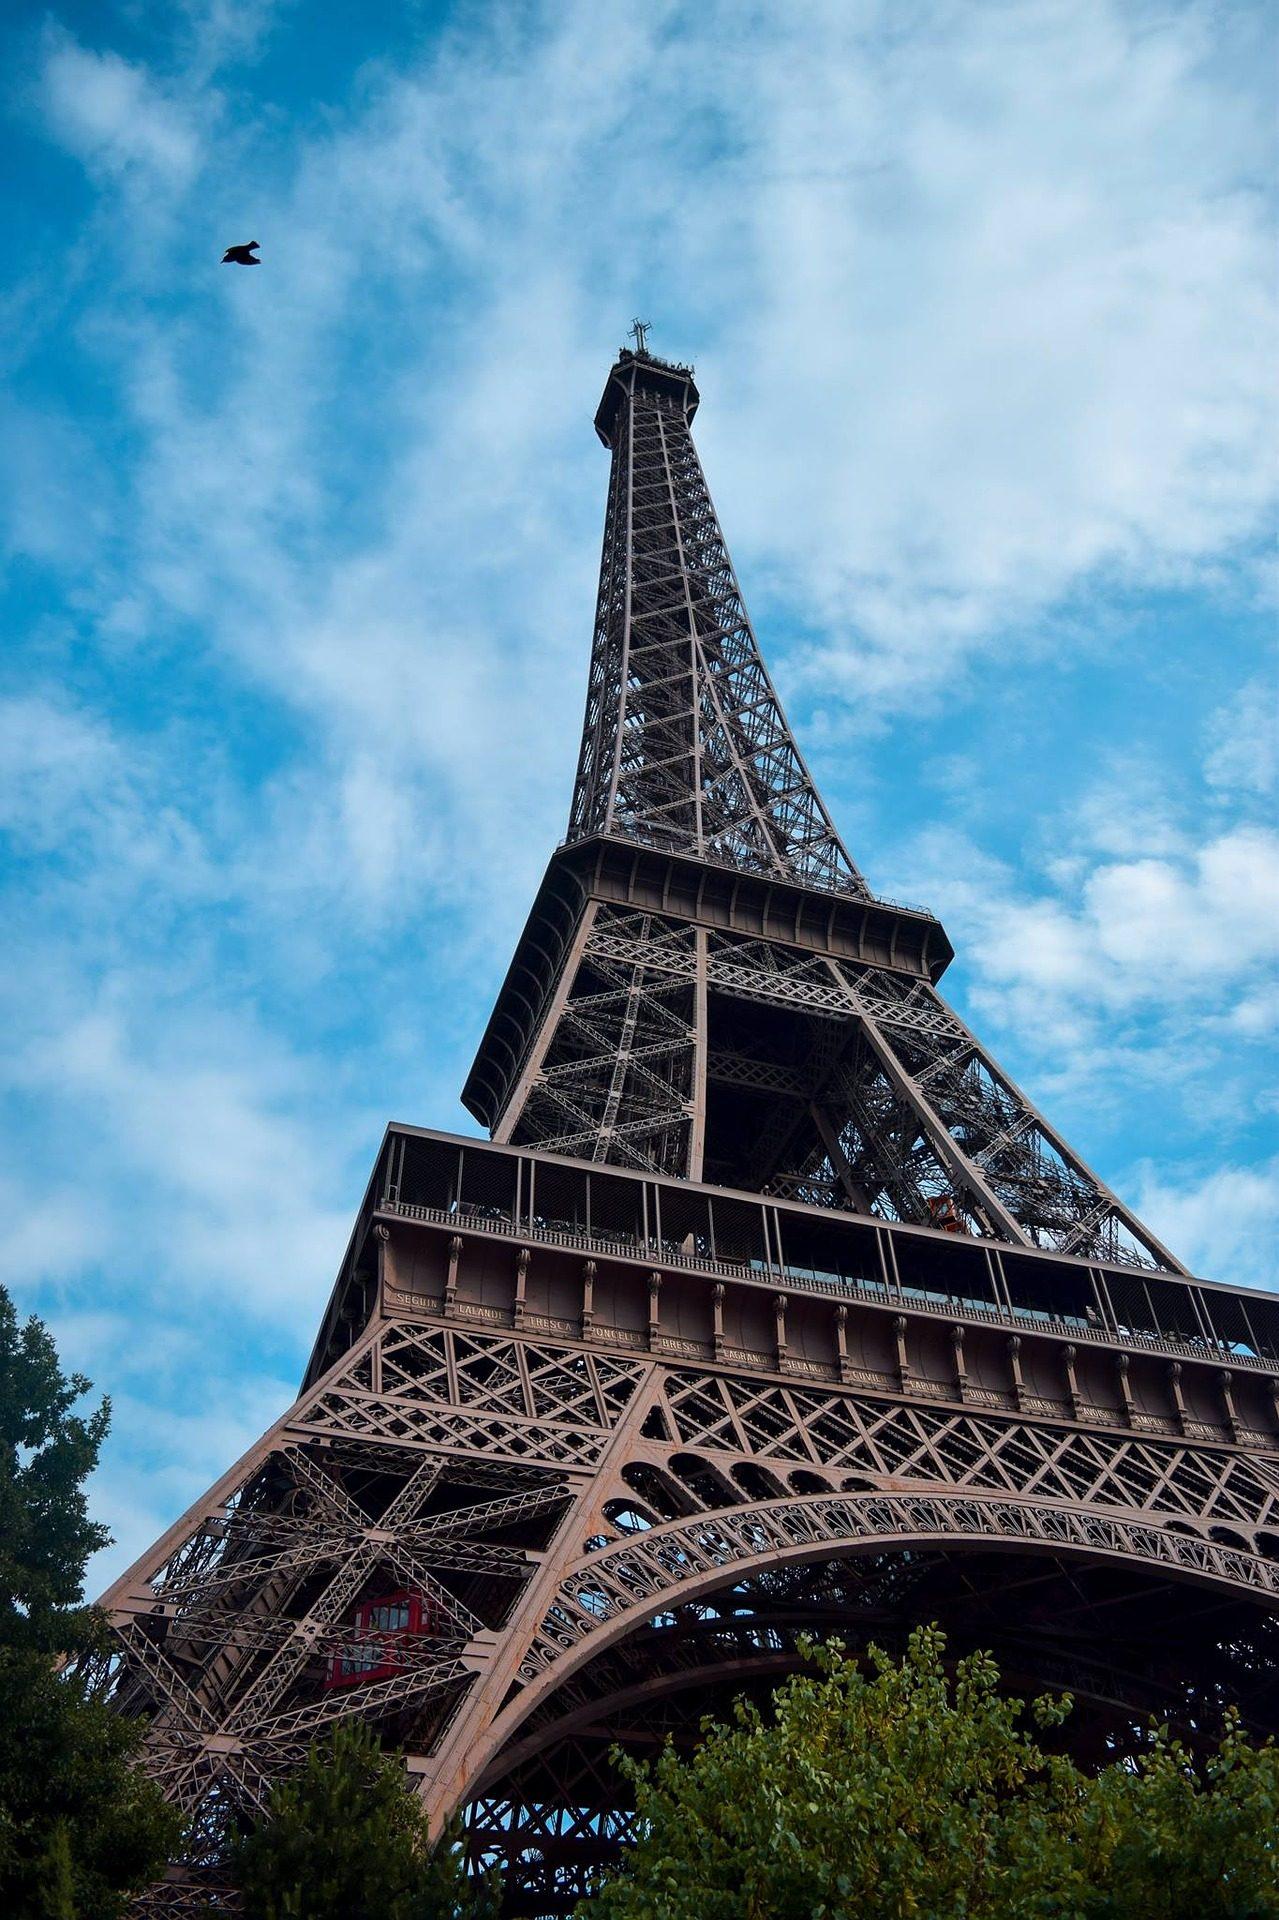 Torre, Eifel, Monumento, altezza, Parigi - Sfondi HD - Professor-falken.com